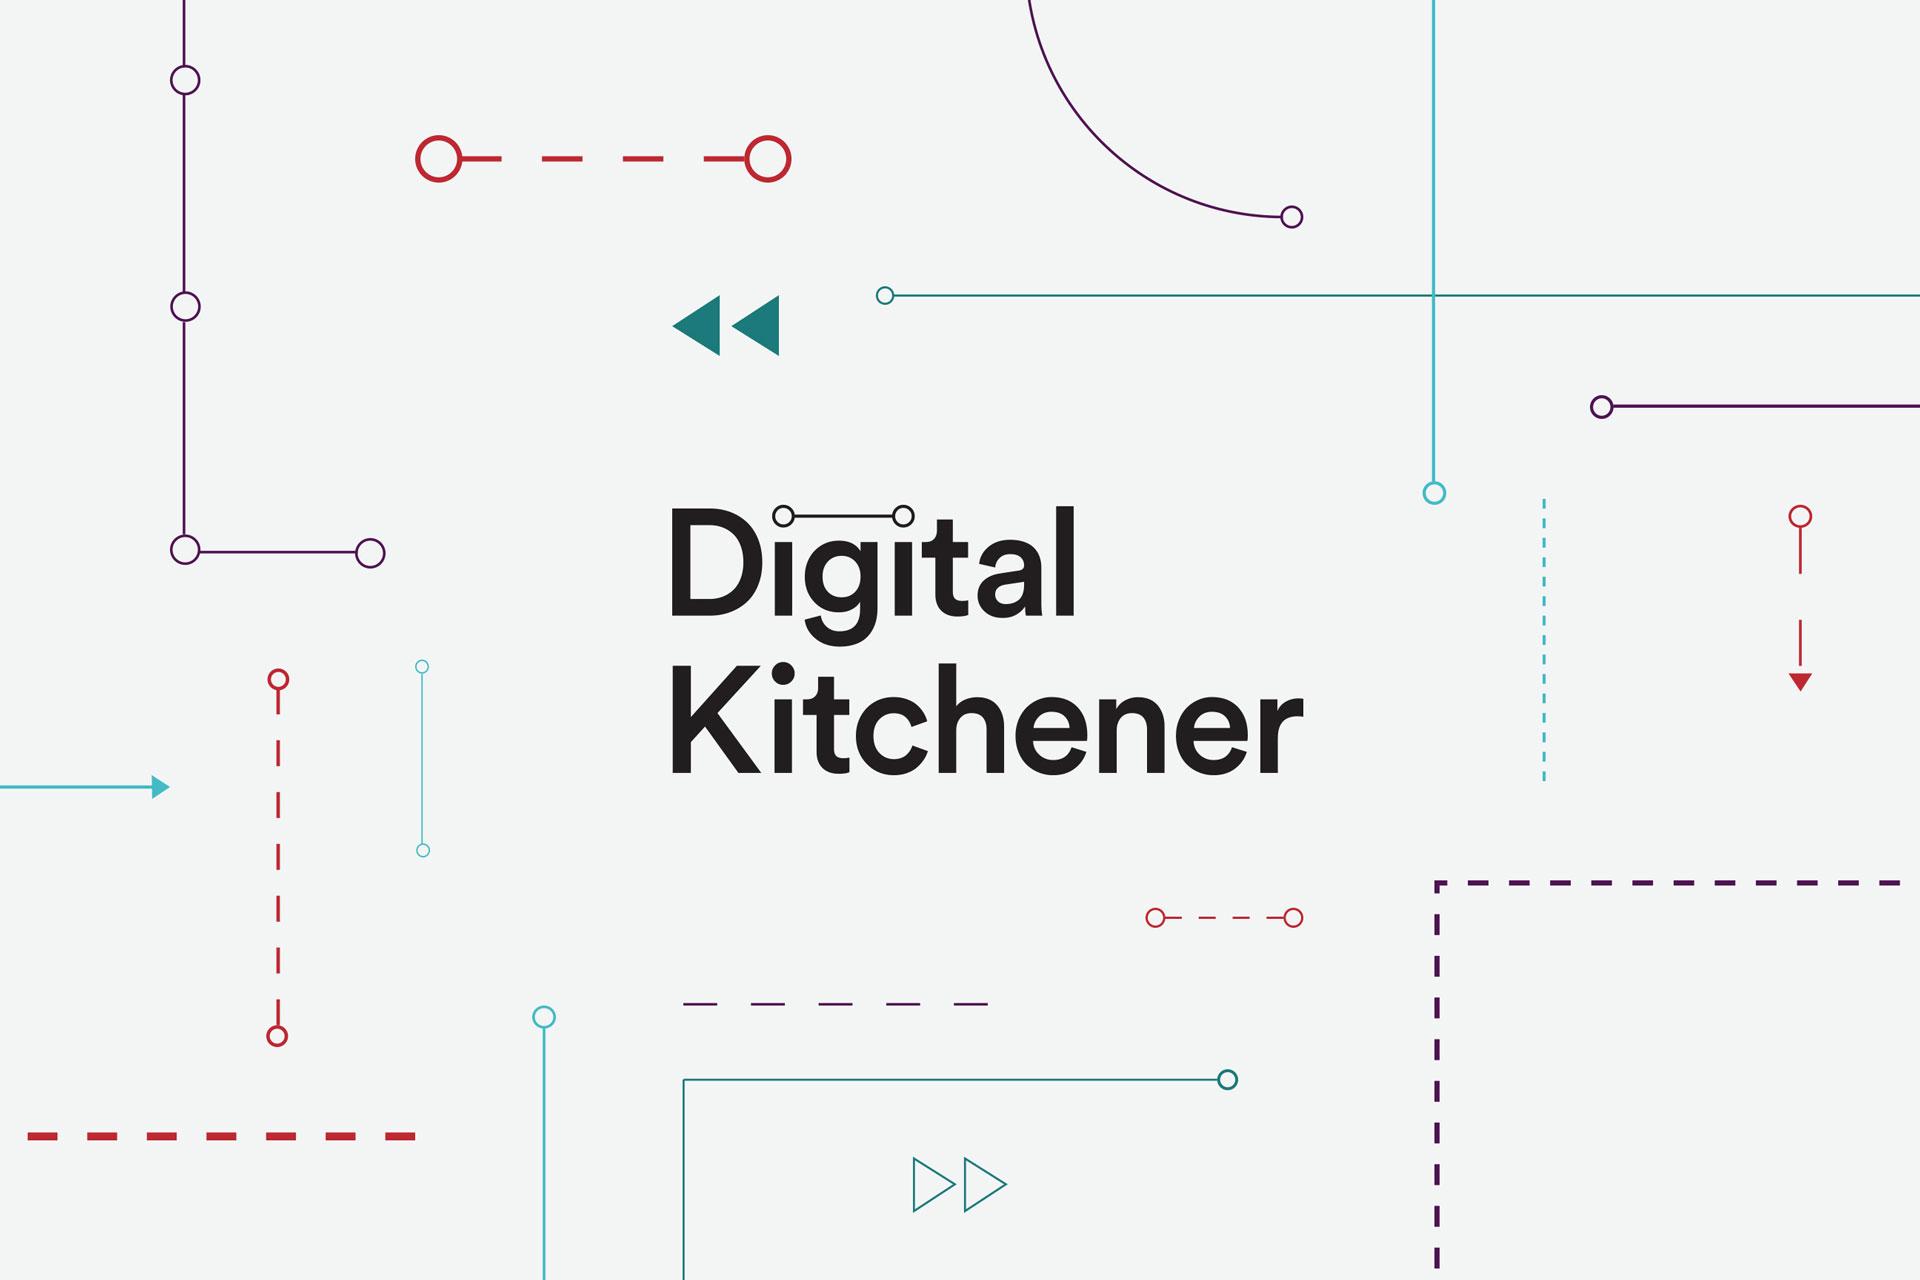 Studio Locale   Digital Kitchener Visual Identity and Publication Design